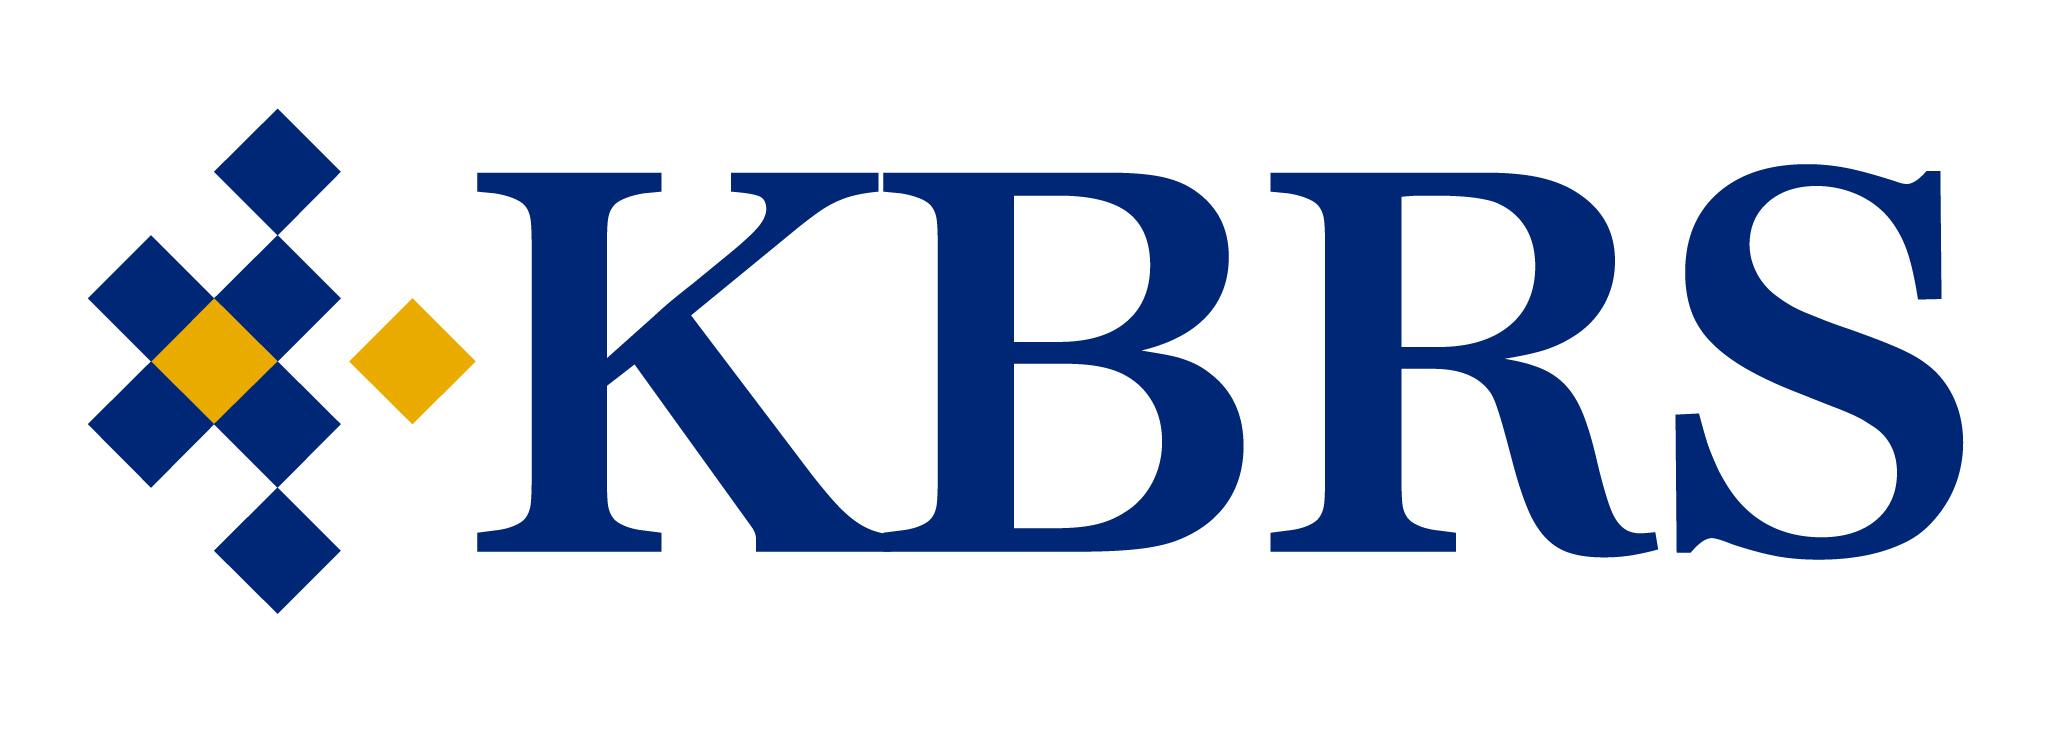 Knightsbridge Robertson Surrette's Logo